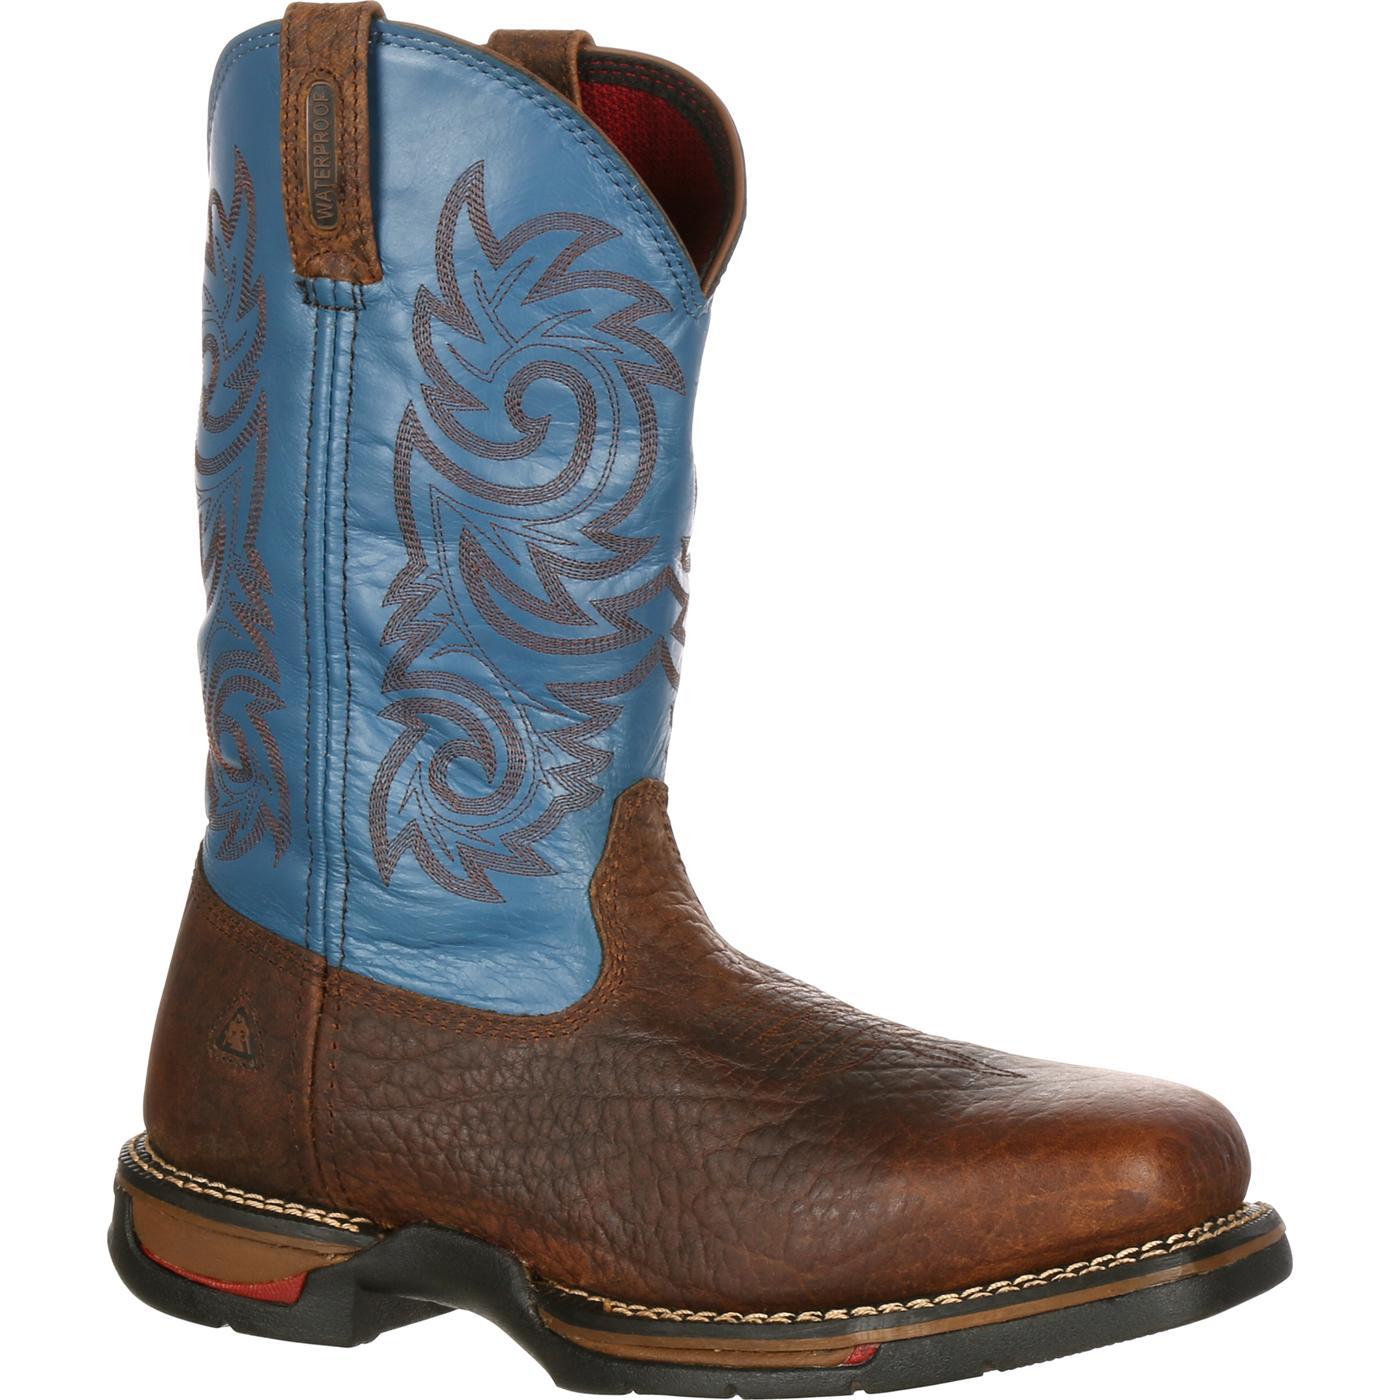 7da5b2a55c5 RW028 Rocky Long Range Carbon-Fiber Toe Waterproof Western Work Boots